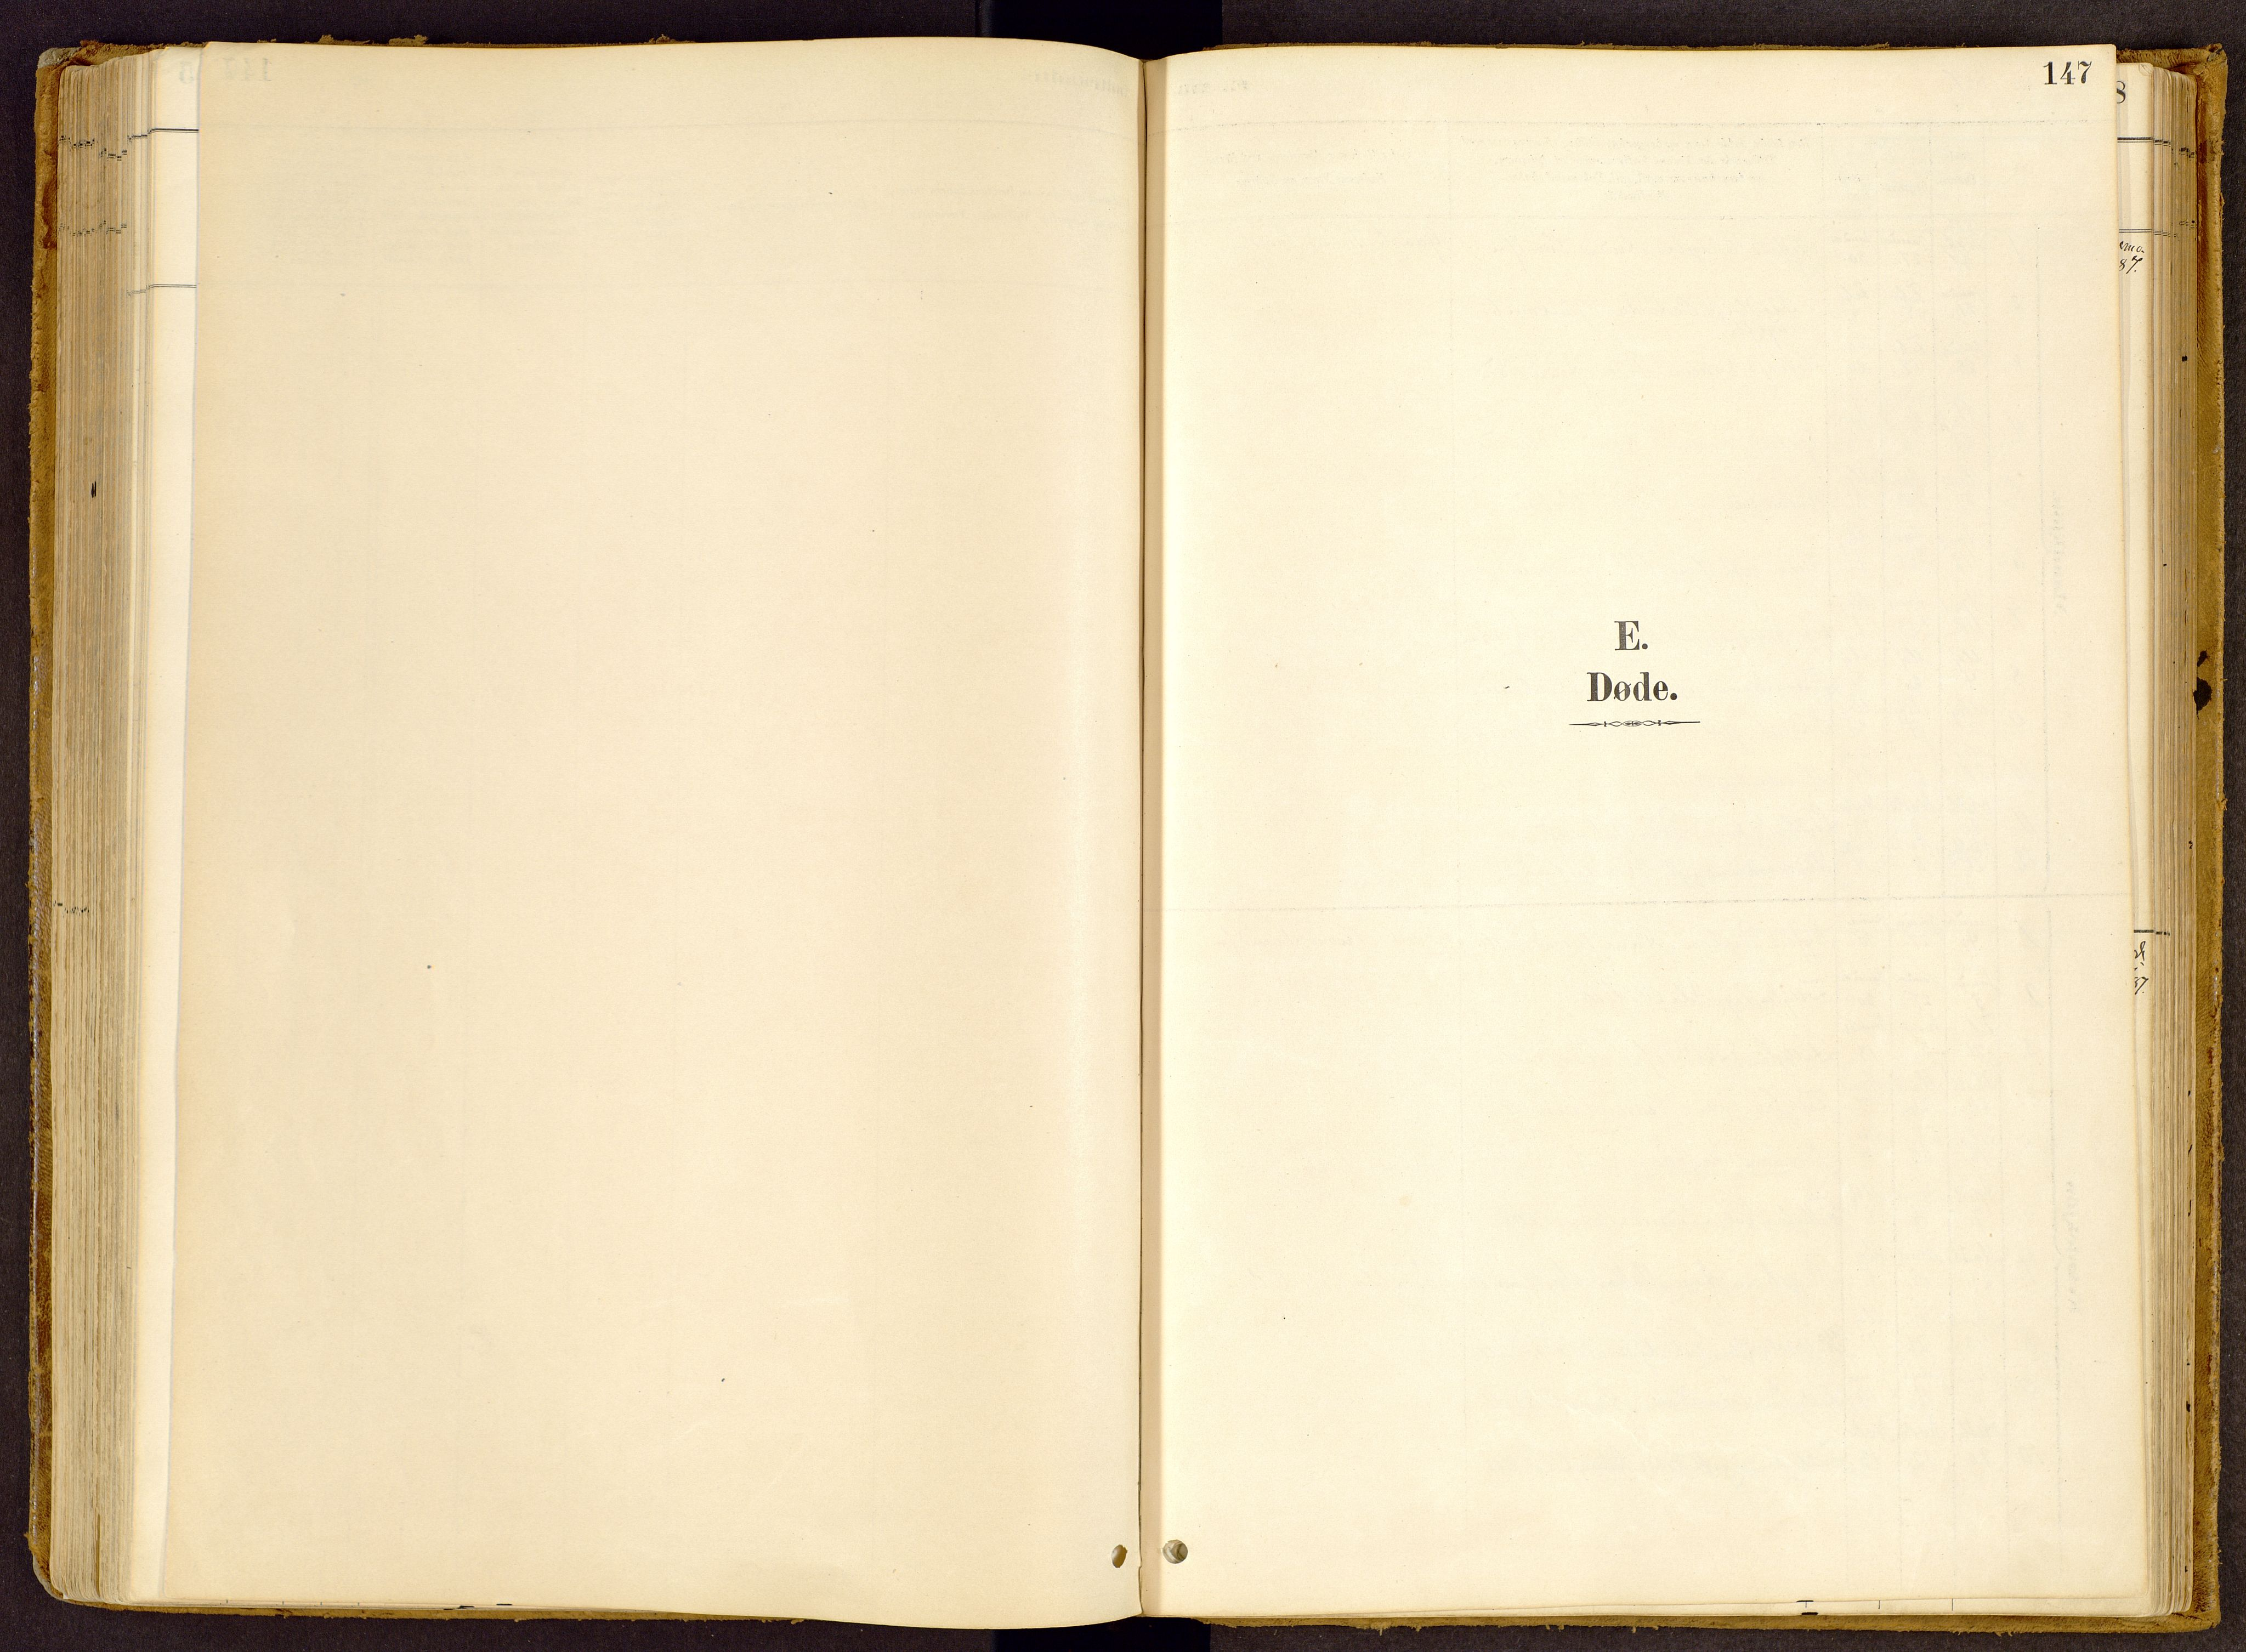 SAH, Vestre Gausdal prestekontor, Ministerialbok nr. 2, 1887-1918, s. 147